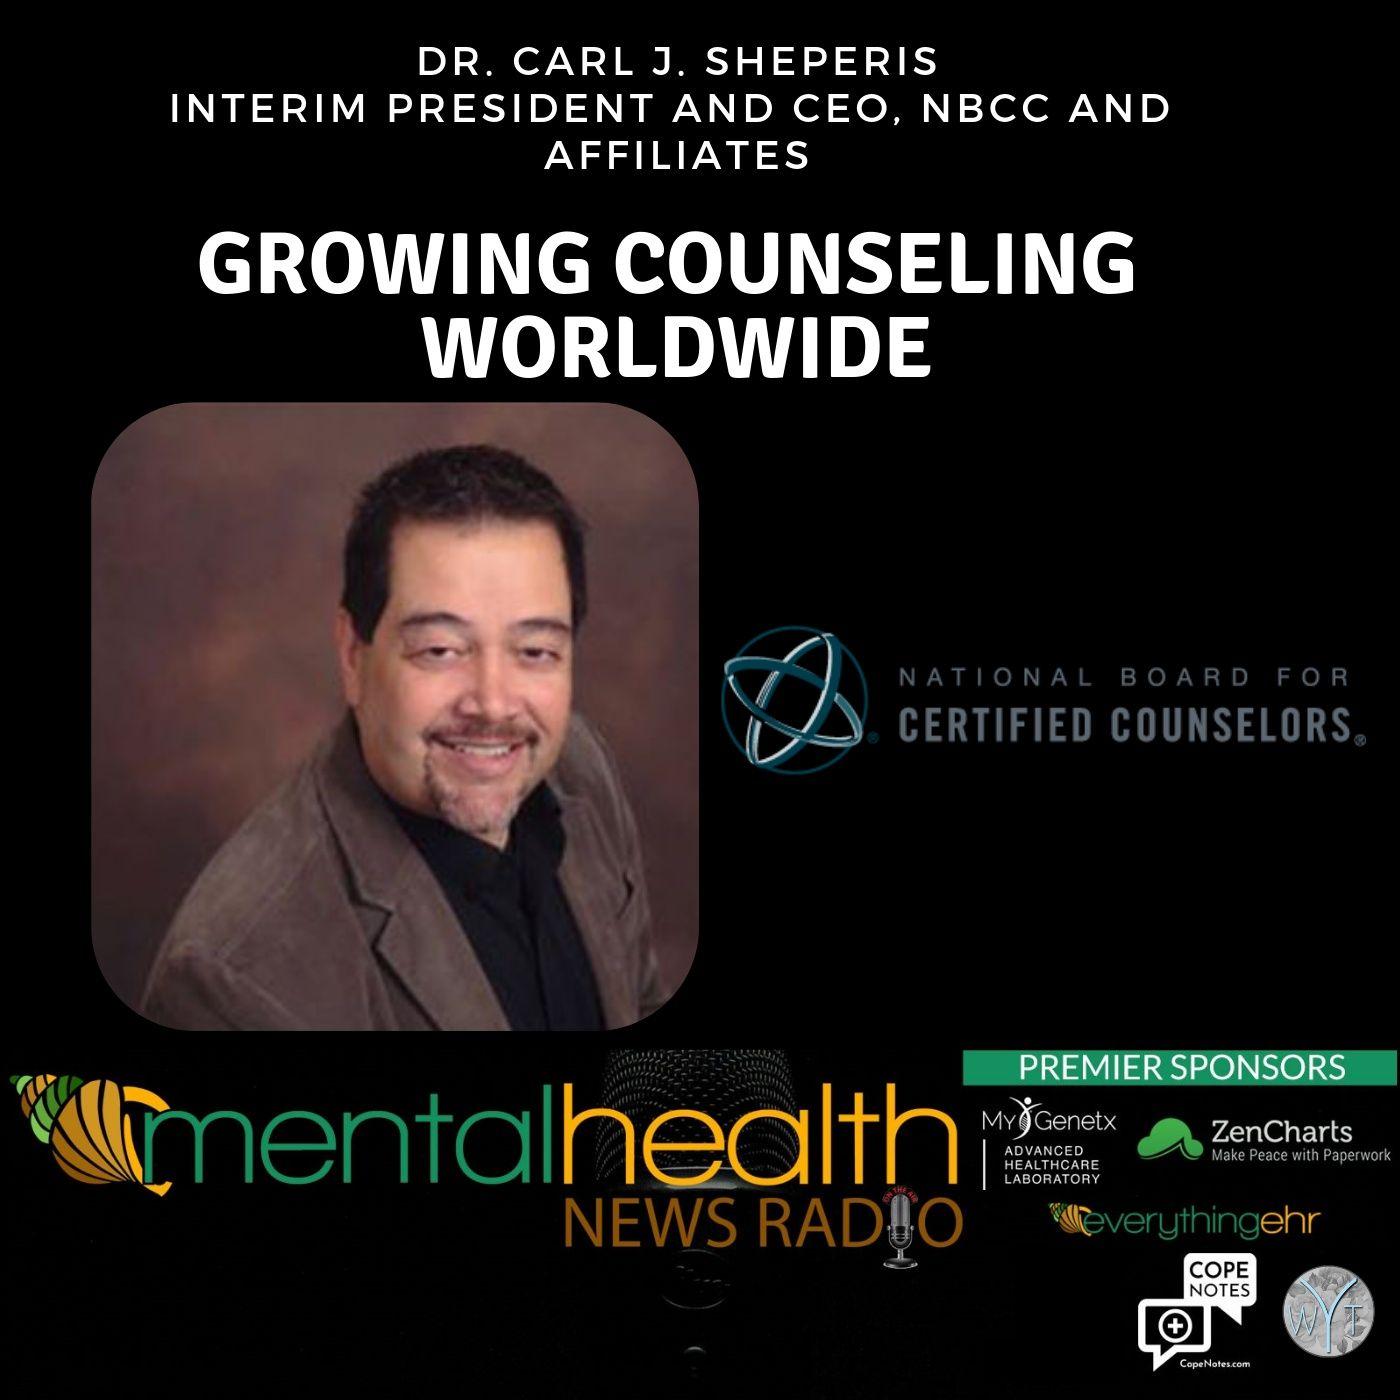 Mental Health News Radio - Growing Counseling Worldwide with Dr. Carl J. Sheperis